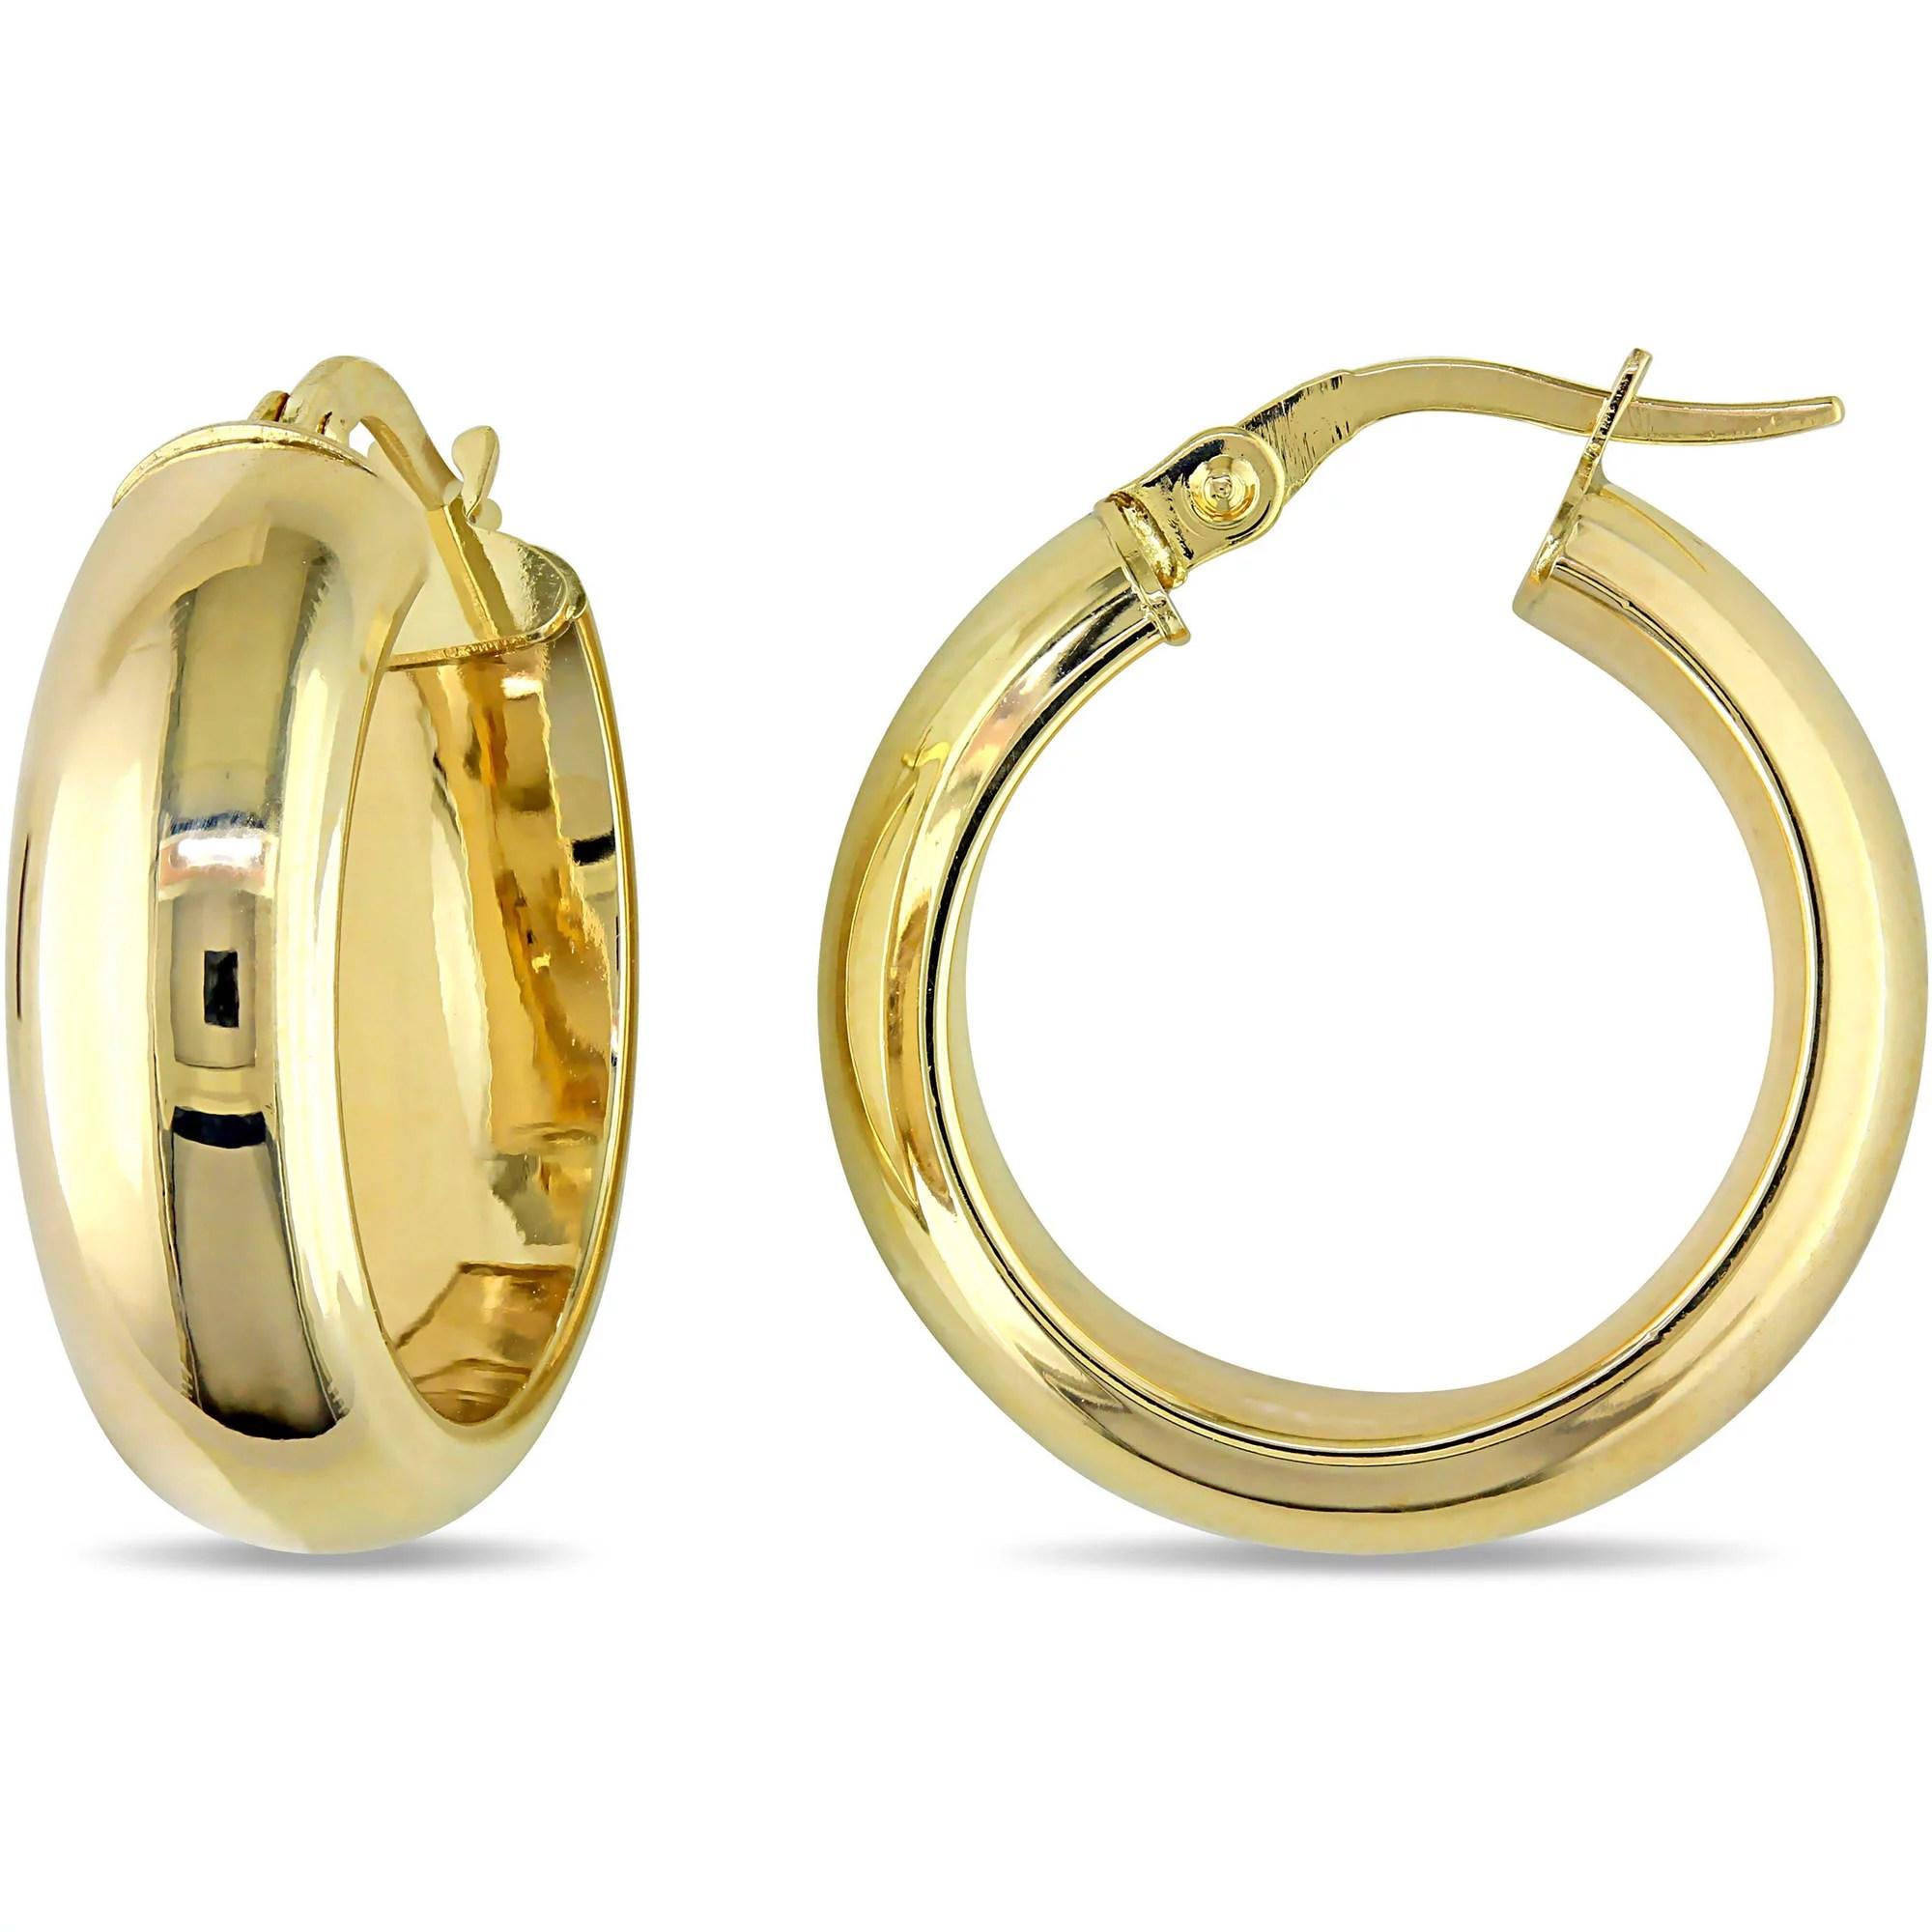 Classic 10 Karat Yellow Gold Hoop Earrings (20mm Diameter